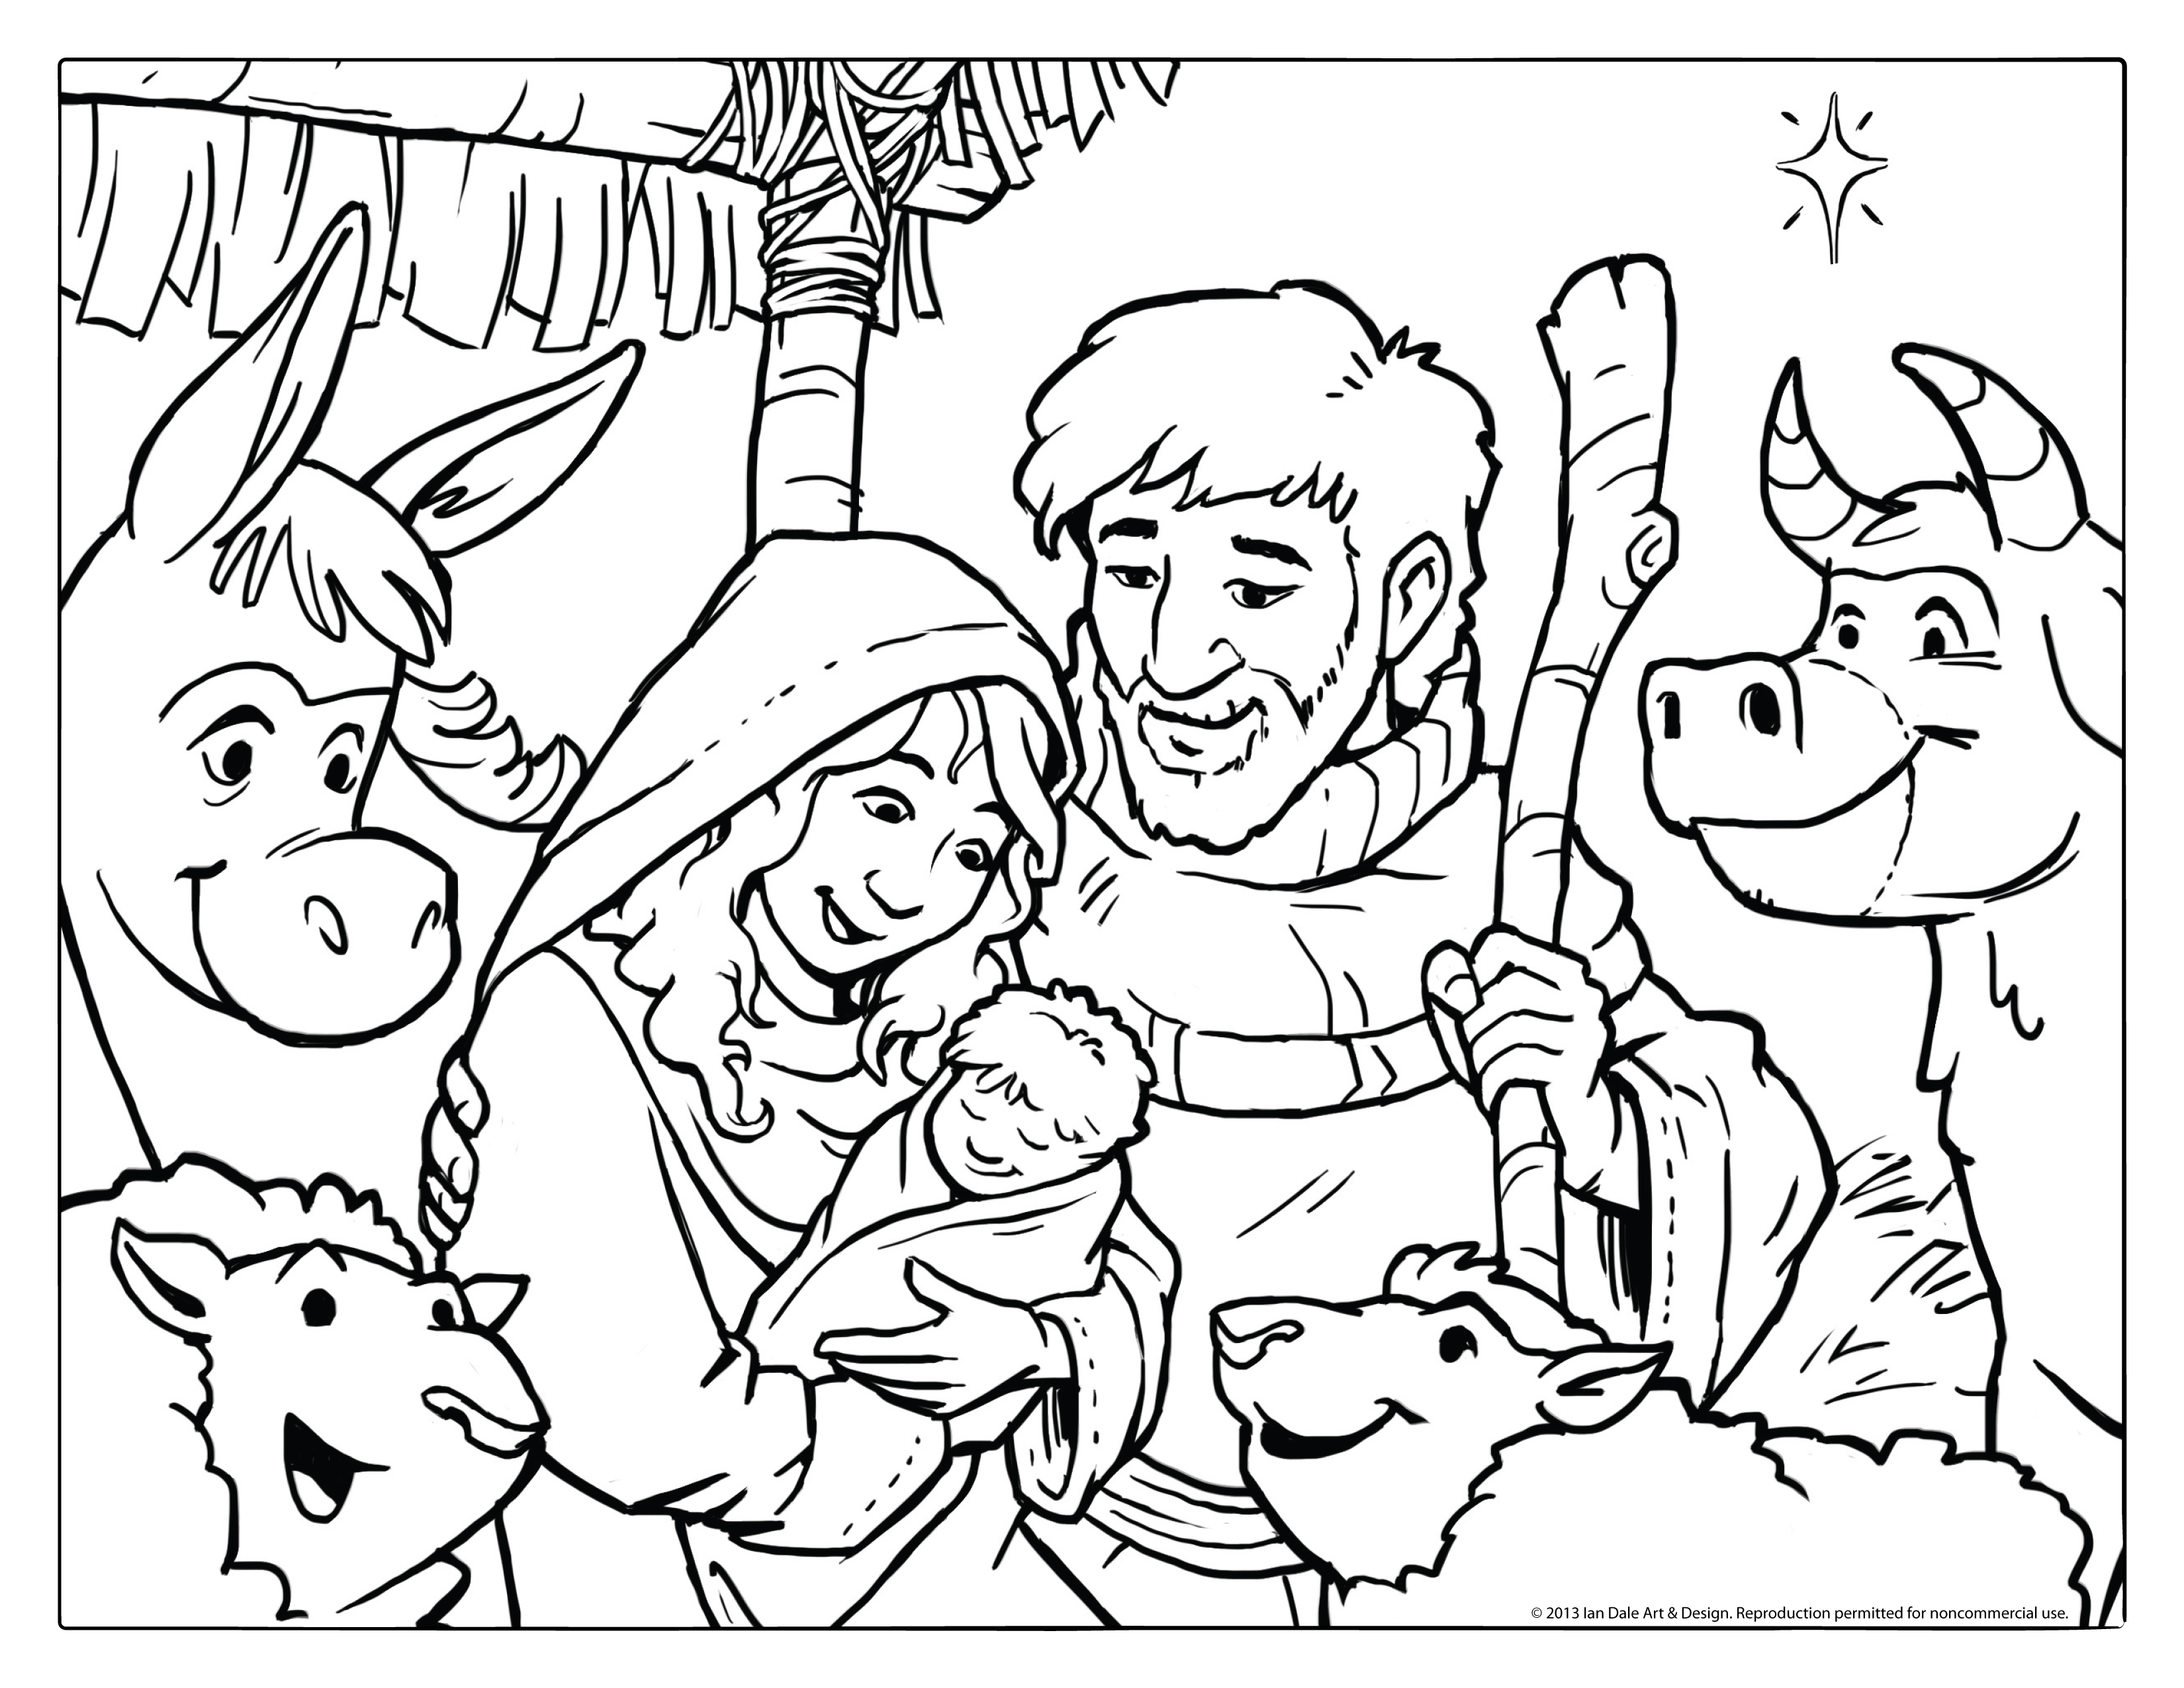 Baby Jesus Coloring Pages Printable Free at GetDrawings.com ...